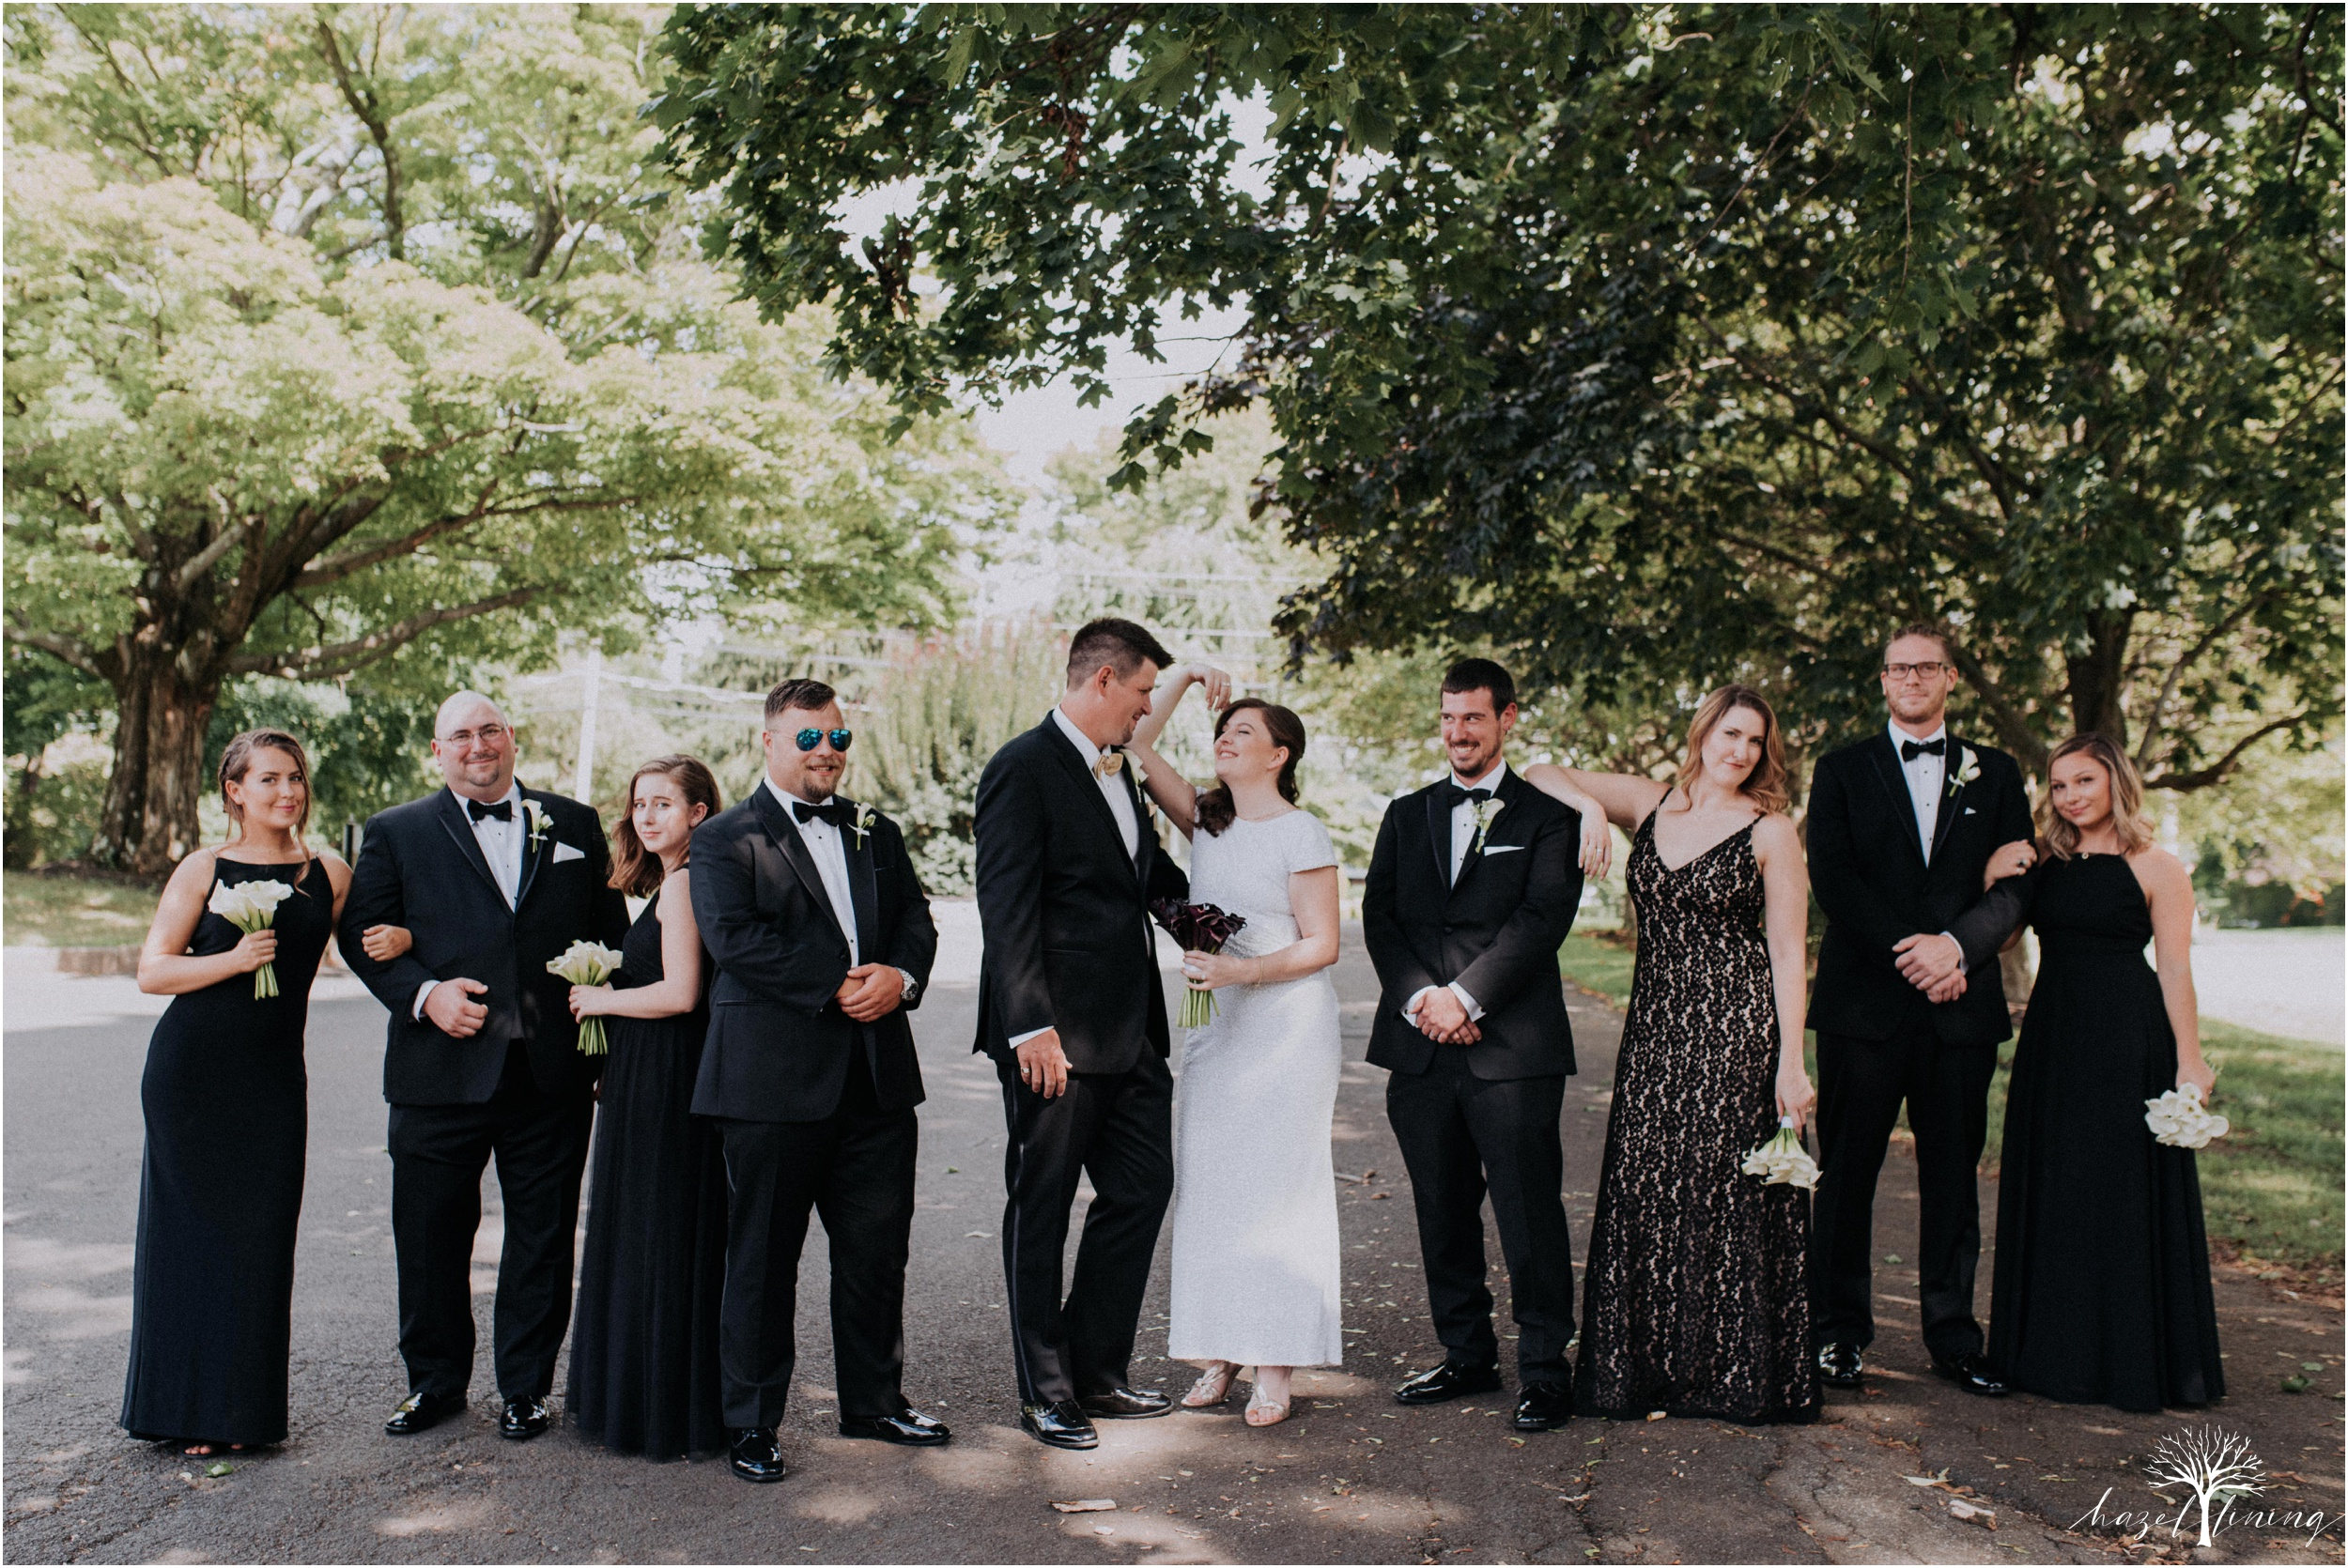 elizabeth-doelp-andrew-foreback-middletown-country-club-summer-langhorne-pennsylvania-wedding-hazel-lining-travel-wedding-elopement-photography_0052.jpg